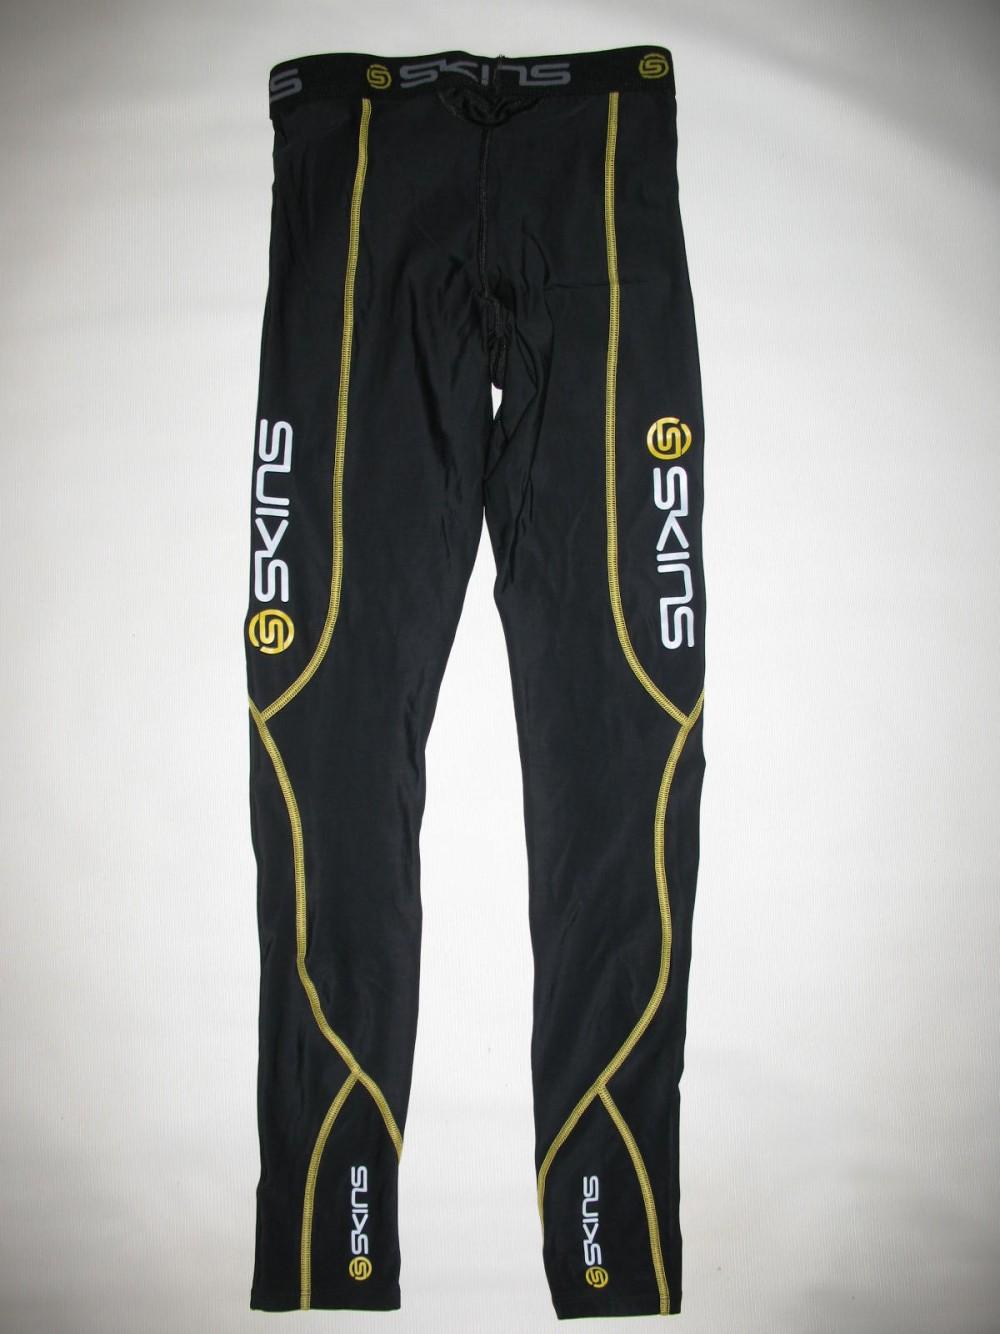 Футболка+брюки SKINS A200 compression long sleeves jersey+long tights (размер M) - 5